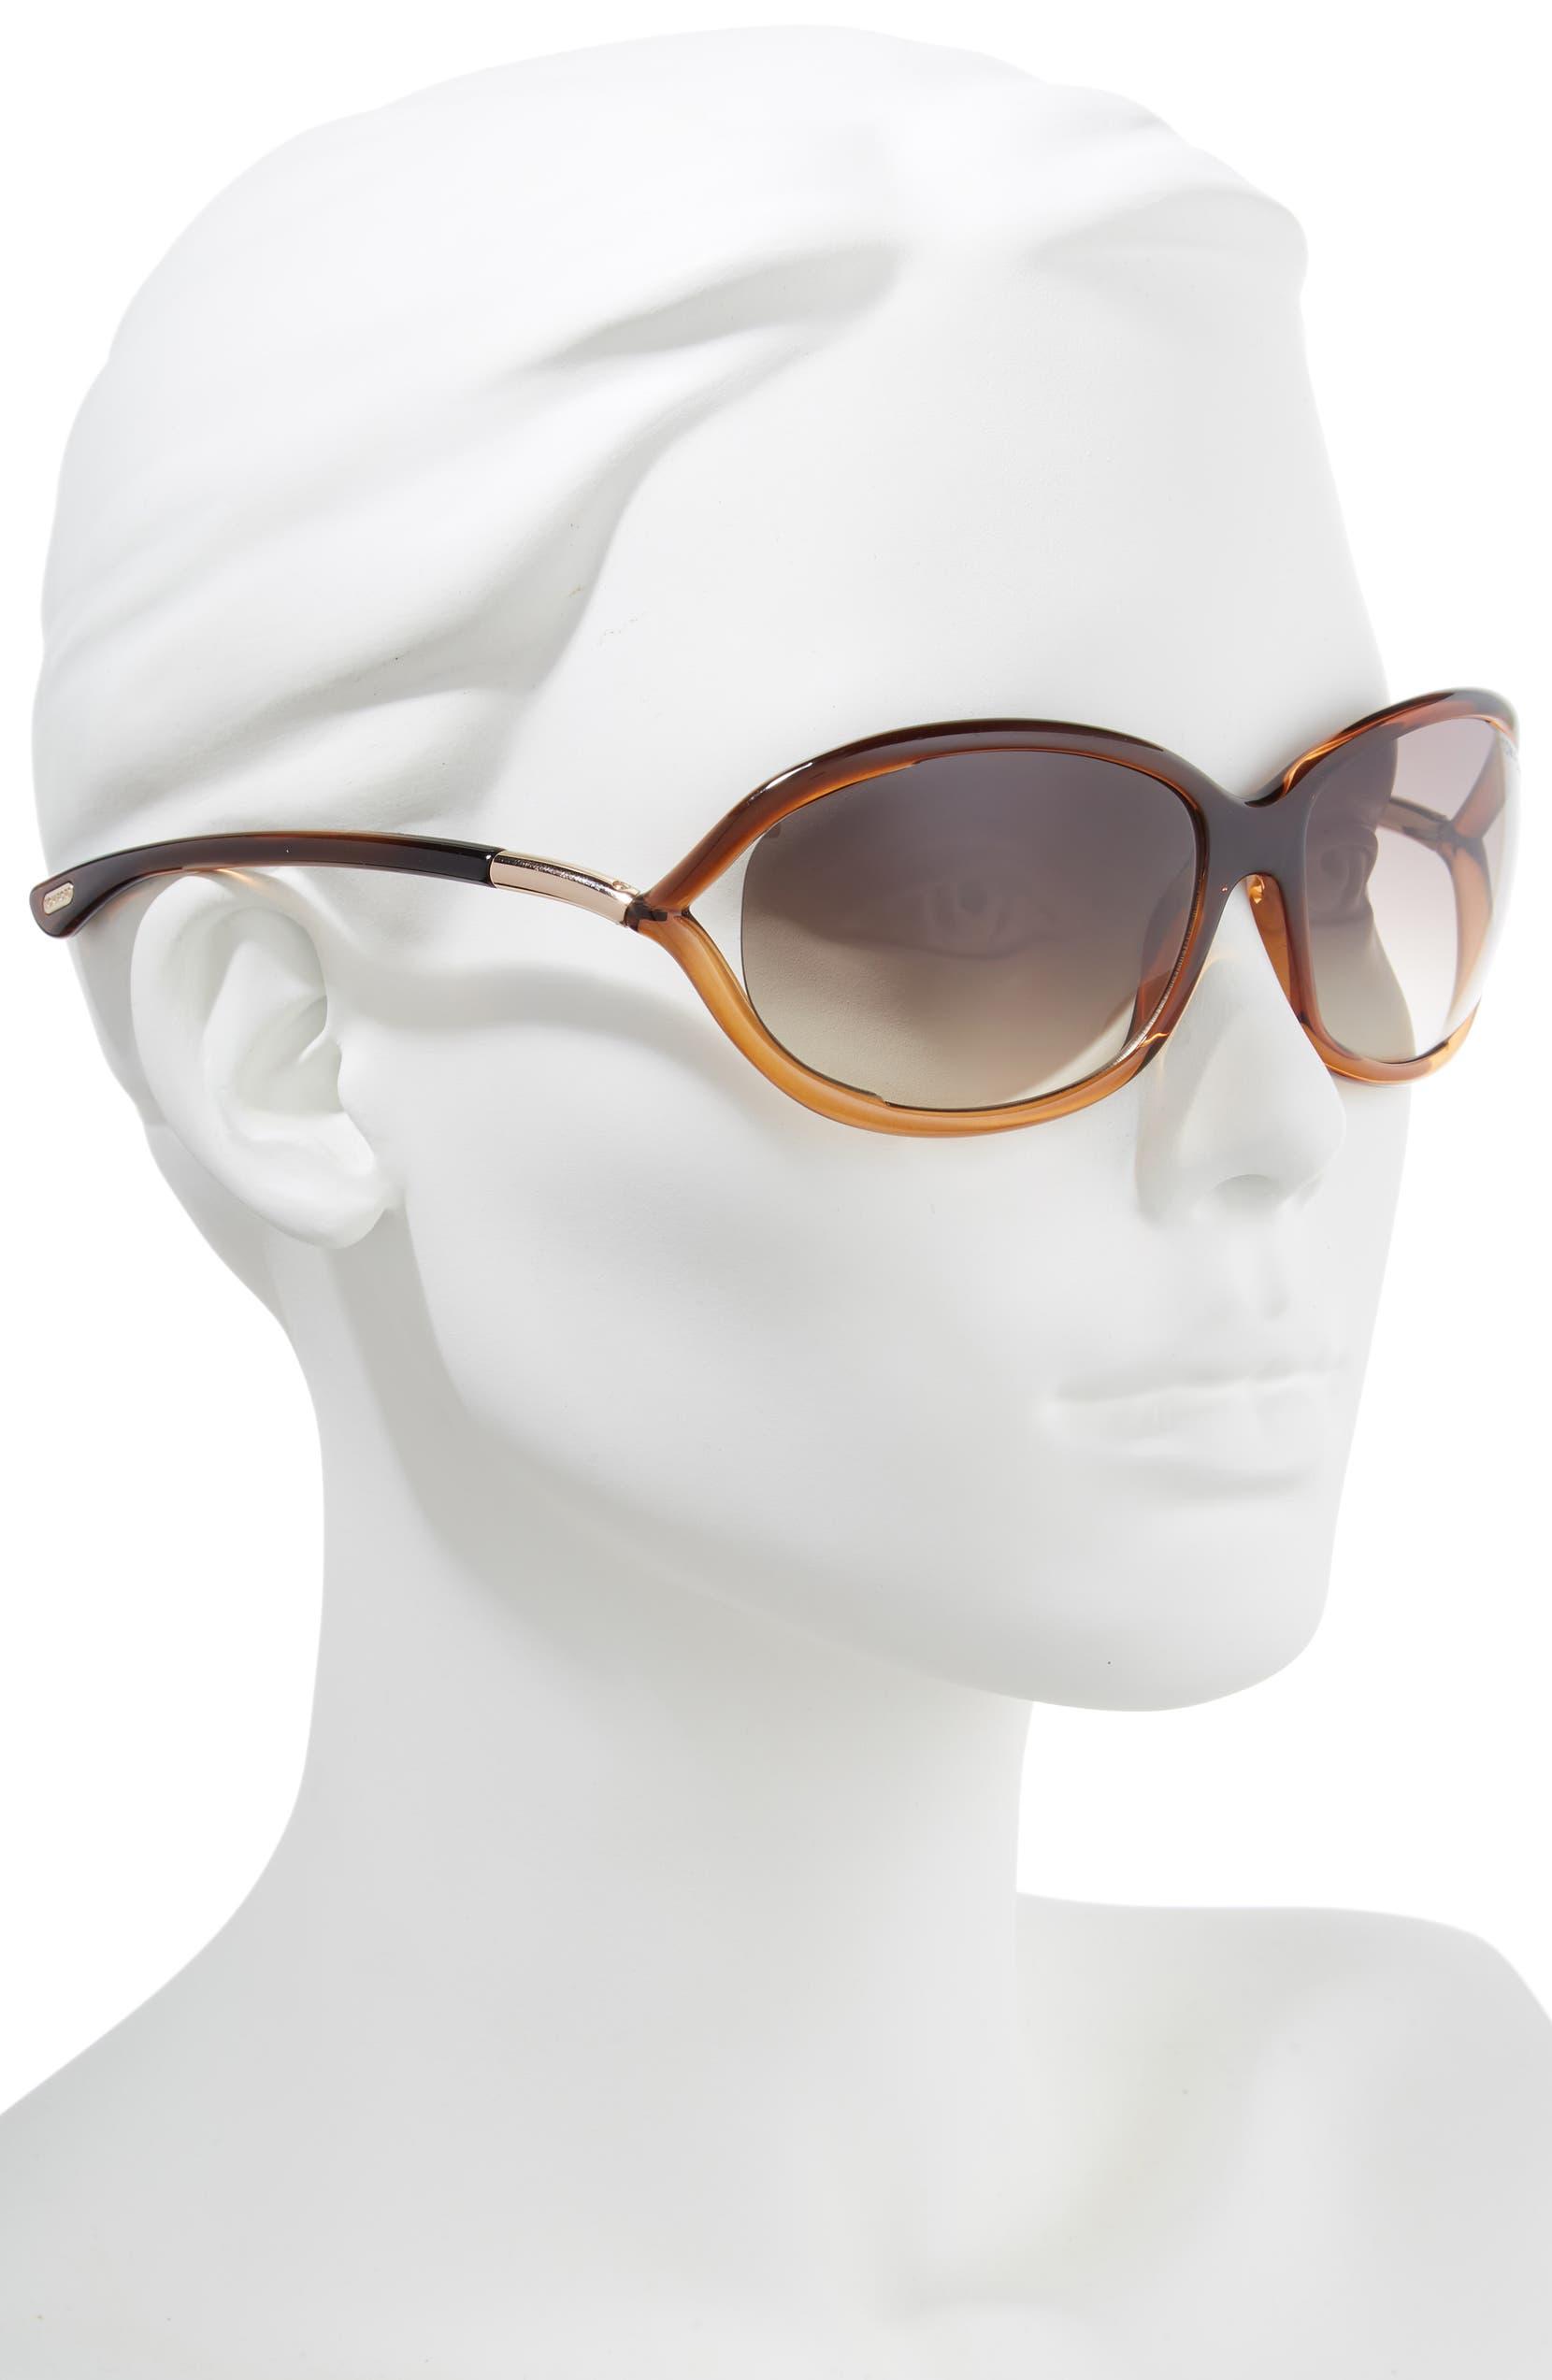 b0457db6dc3a Tom Ford  Jennifer  61mm Oval Oversize Frame Sunglasses